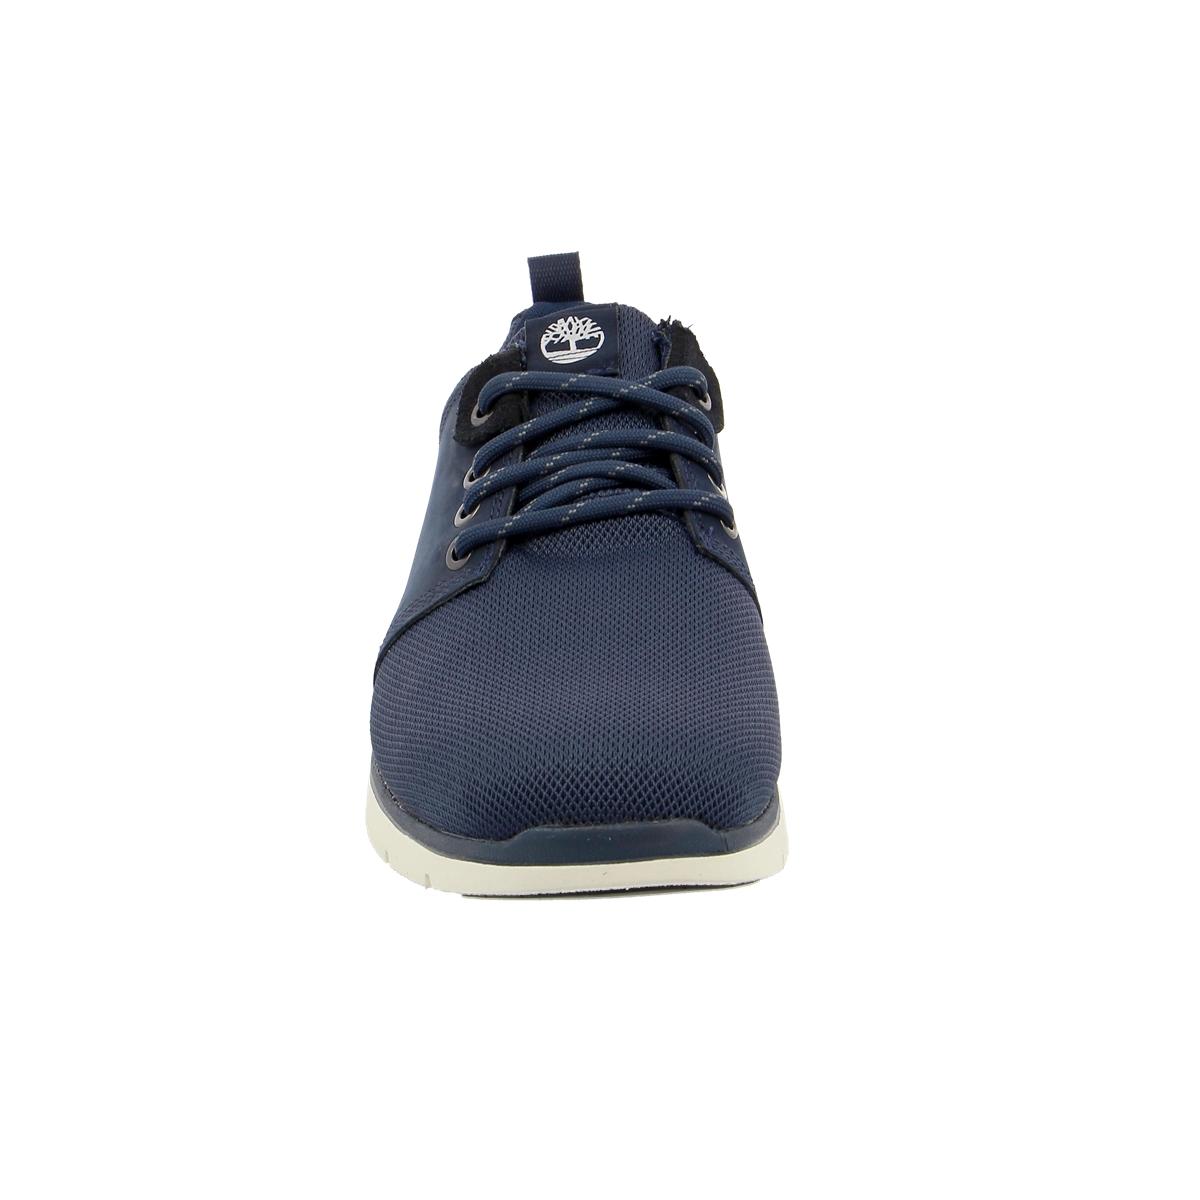 Timberland Sneakers blauw